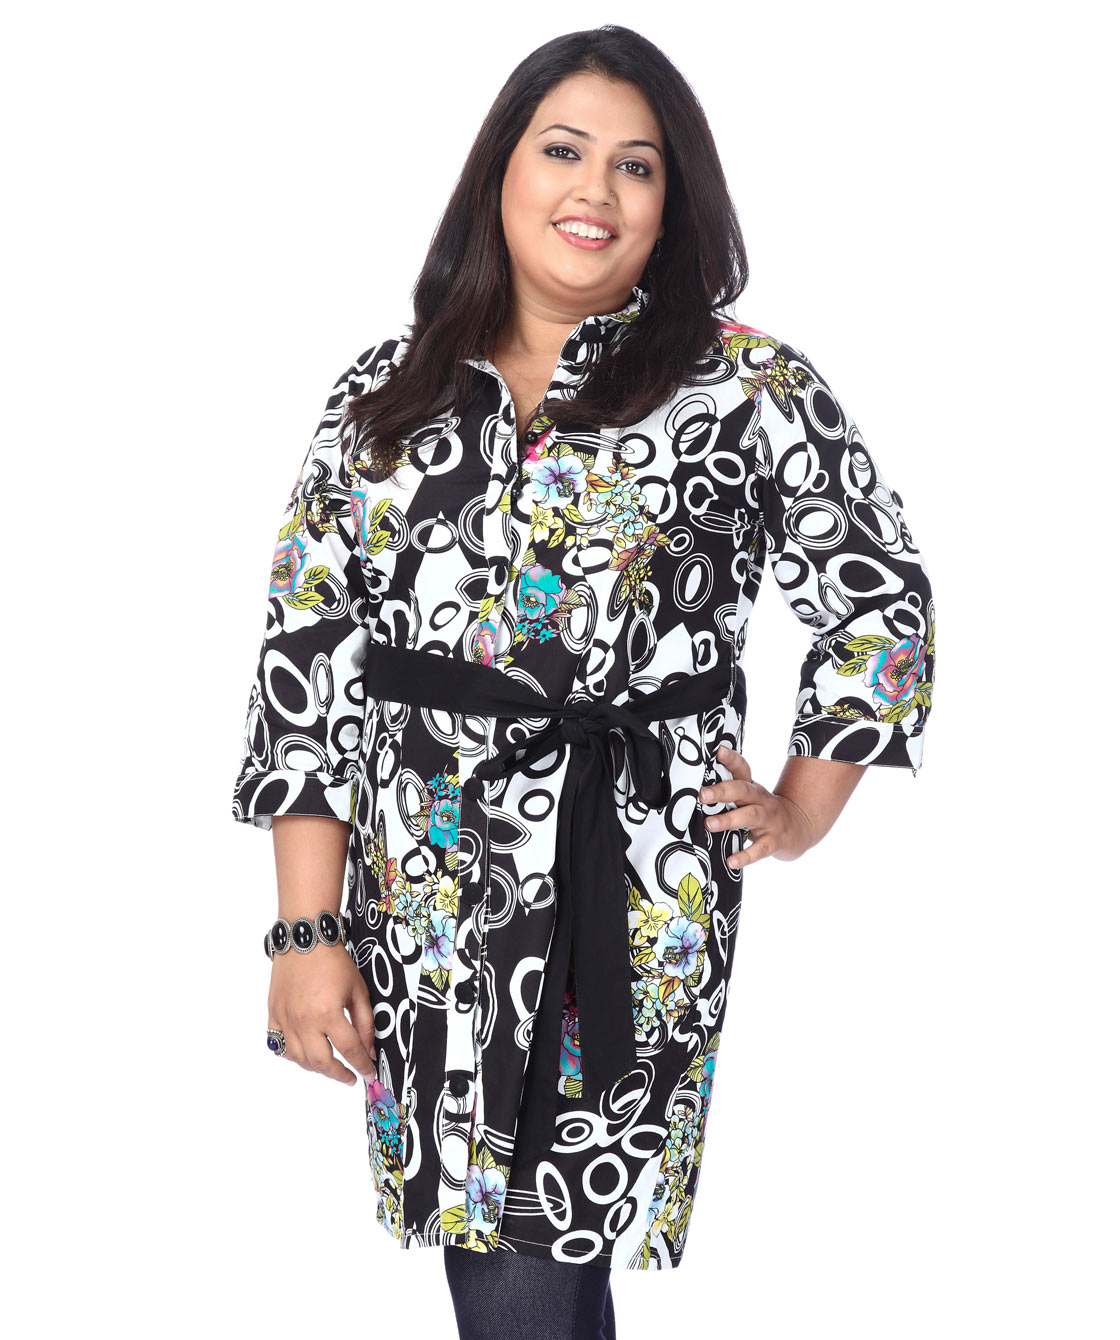 Verdant coat style dress